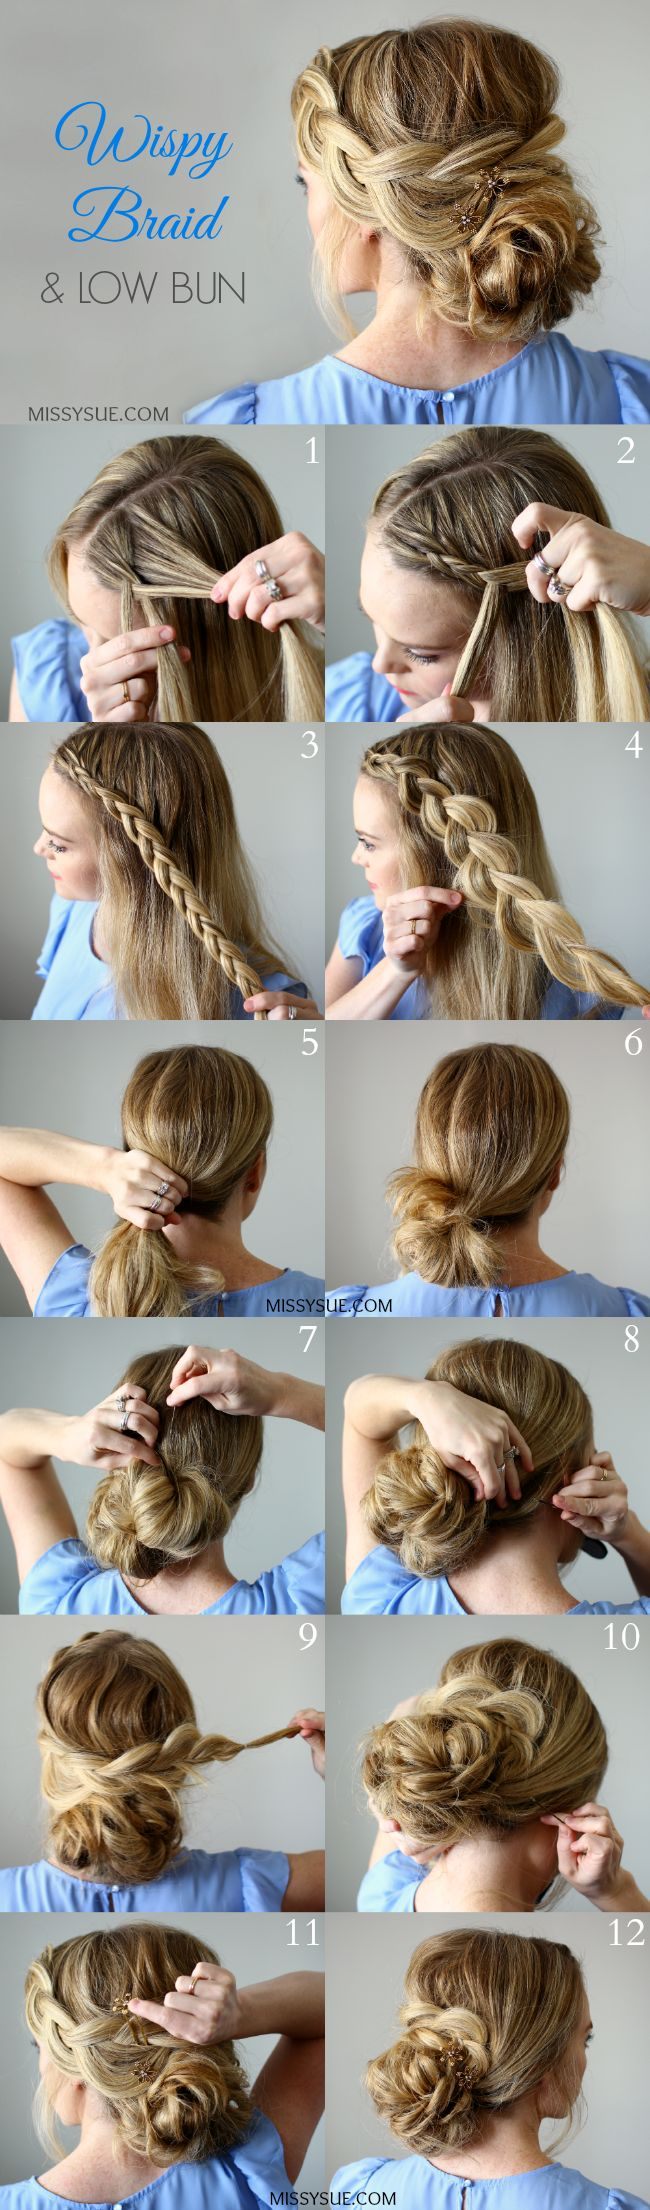 All Things Hair| Wispy Braid and Low Bun